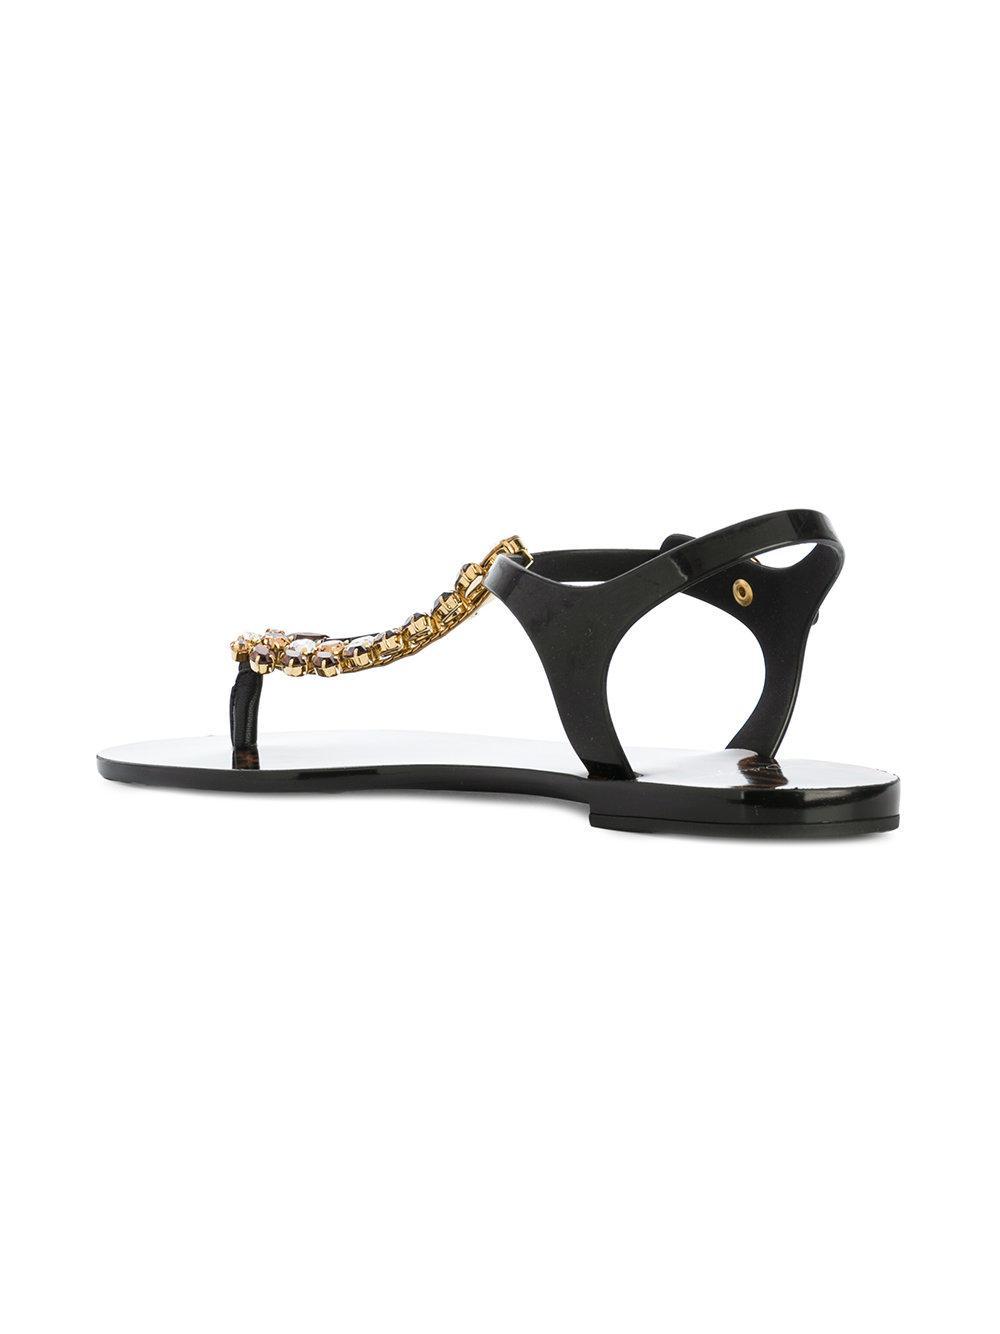 bb4e30575bfa Lyst - Dolce   Gabbana Beachwear Nappa Sandals in Black